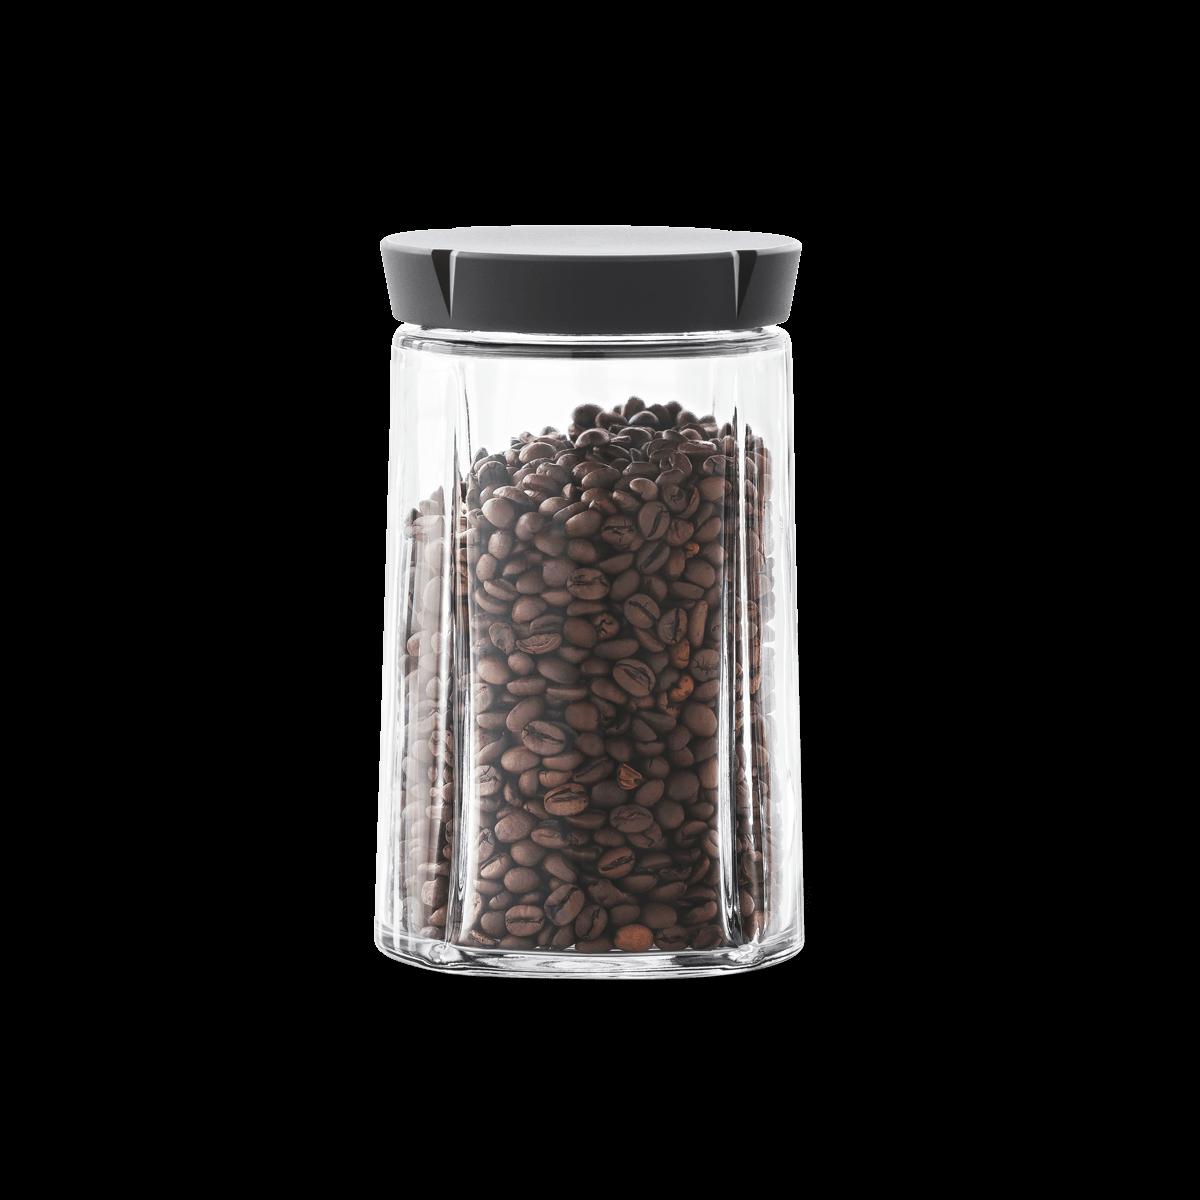 Rosendahl - Grand Cru Jar 1 L - Black (15100)